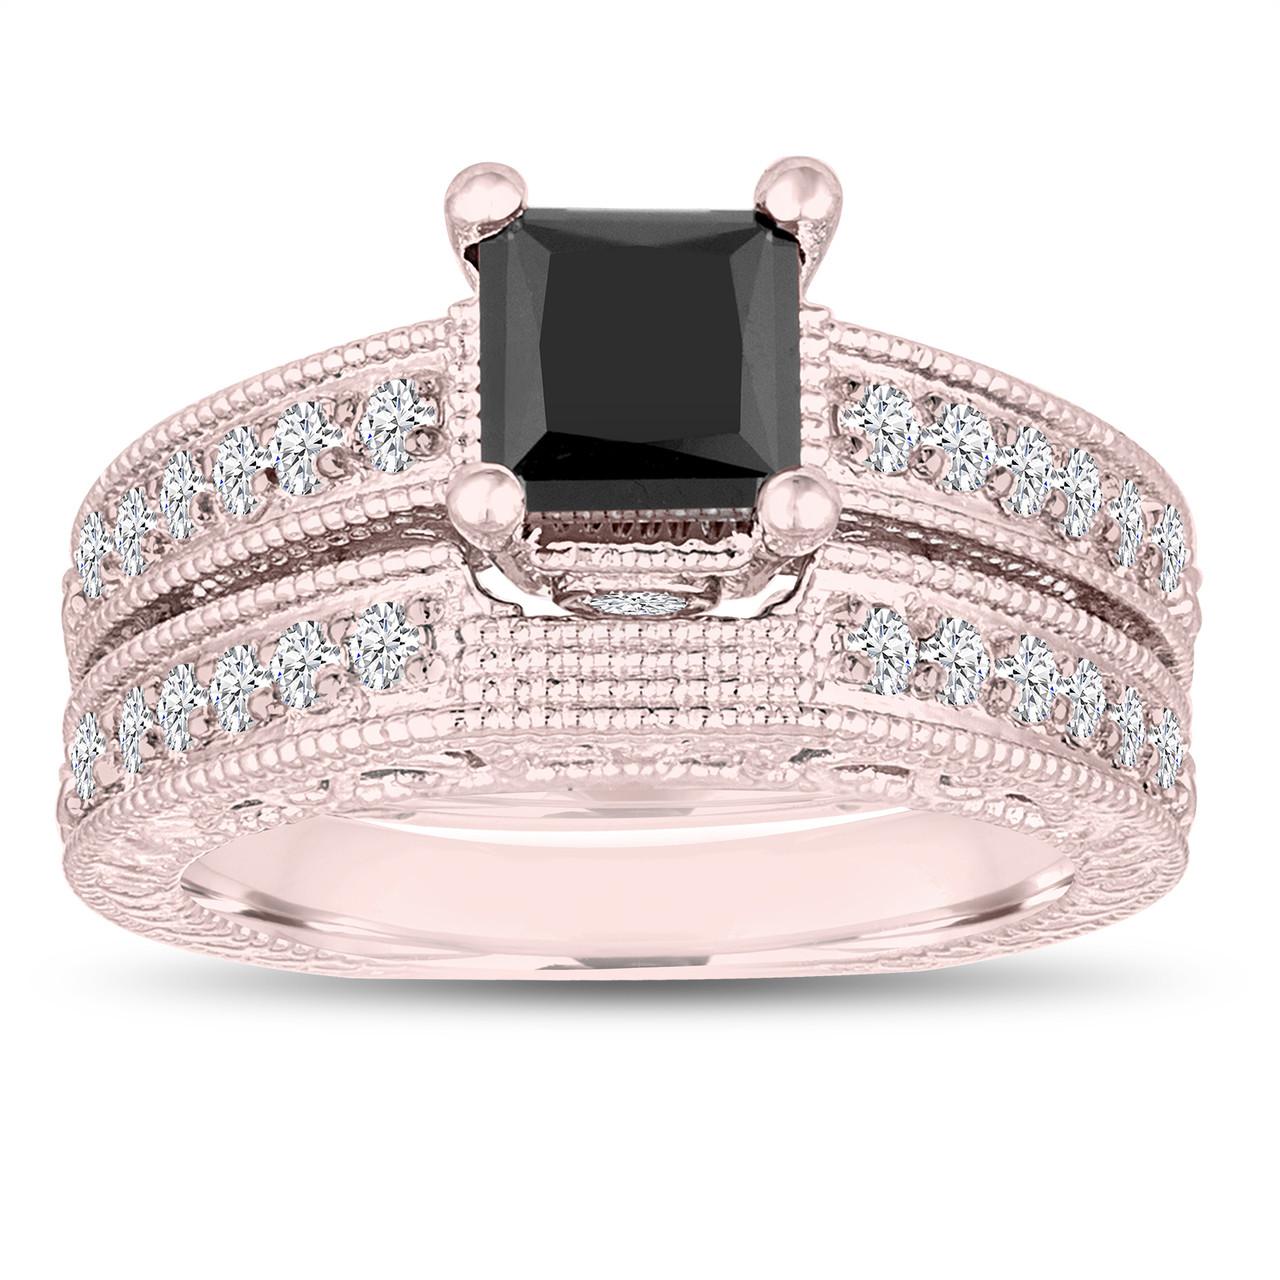 1 81 Carat Princess Cut Fancy Black Diamond Engagement Ring